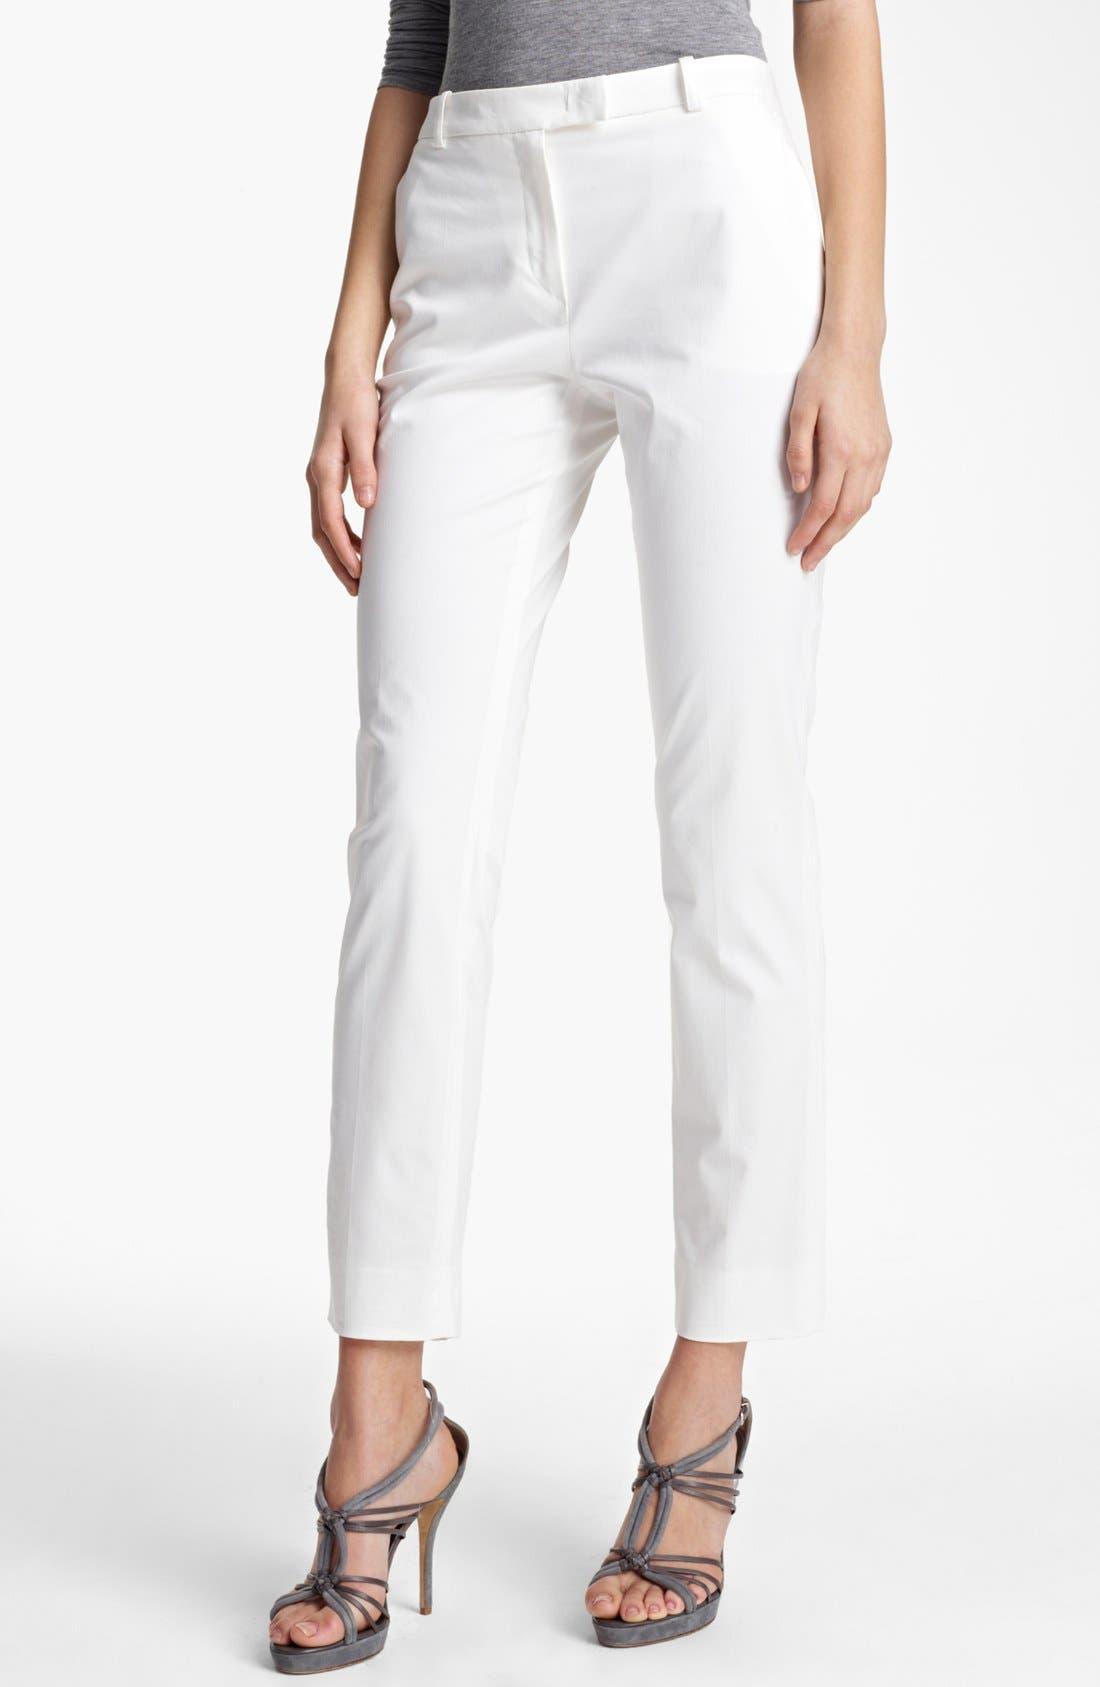 Alternate Image 1 Selected - Armani Collezioni Slim Stretch Cotton Pants